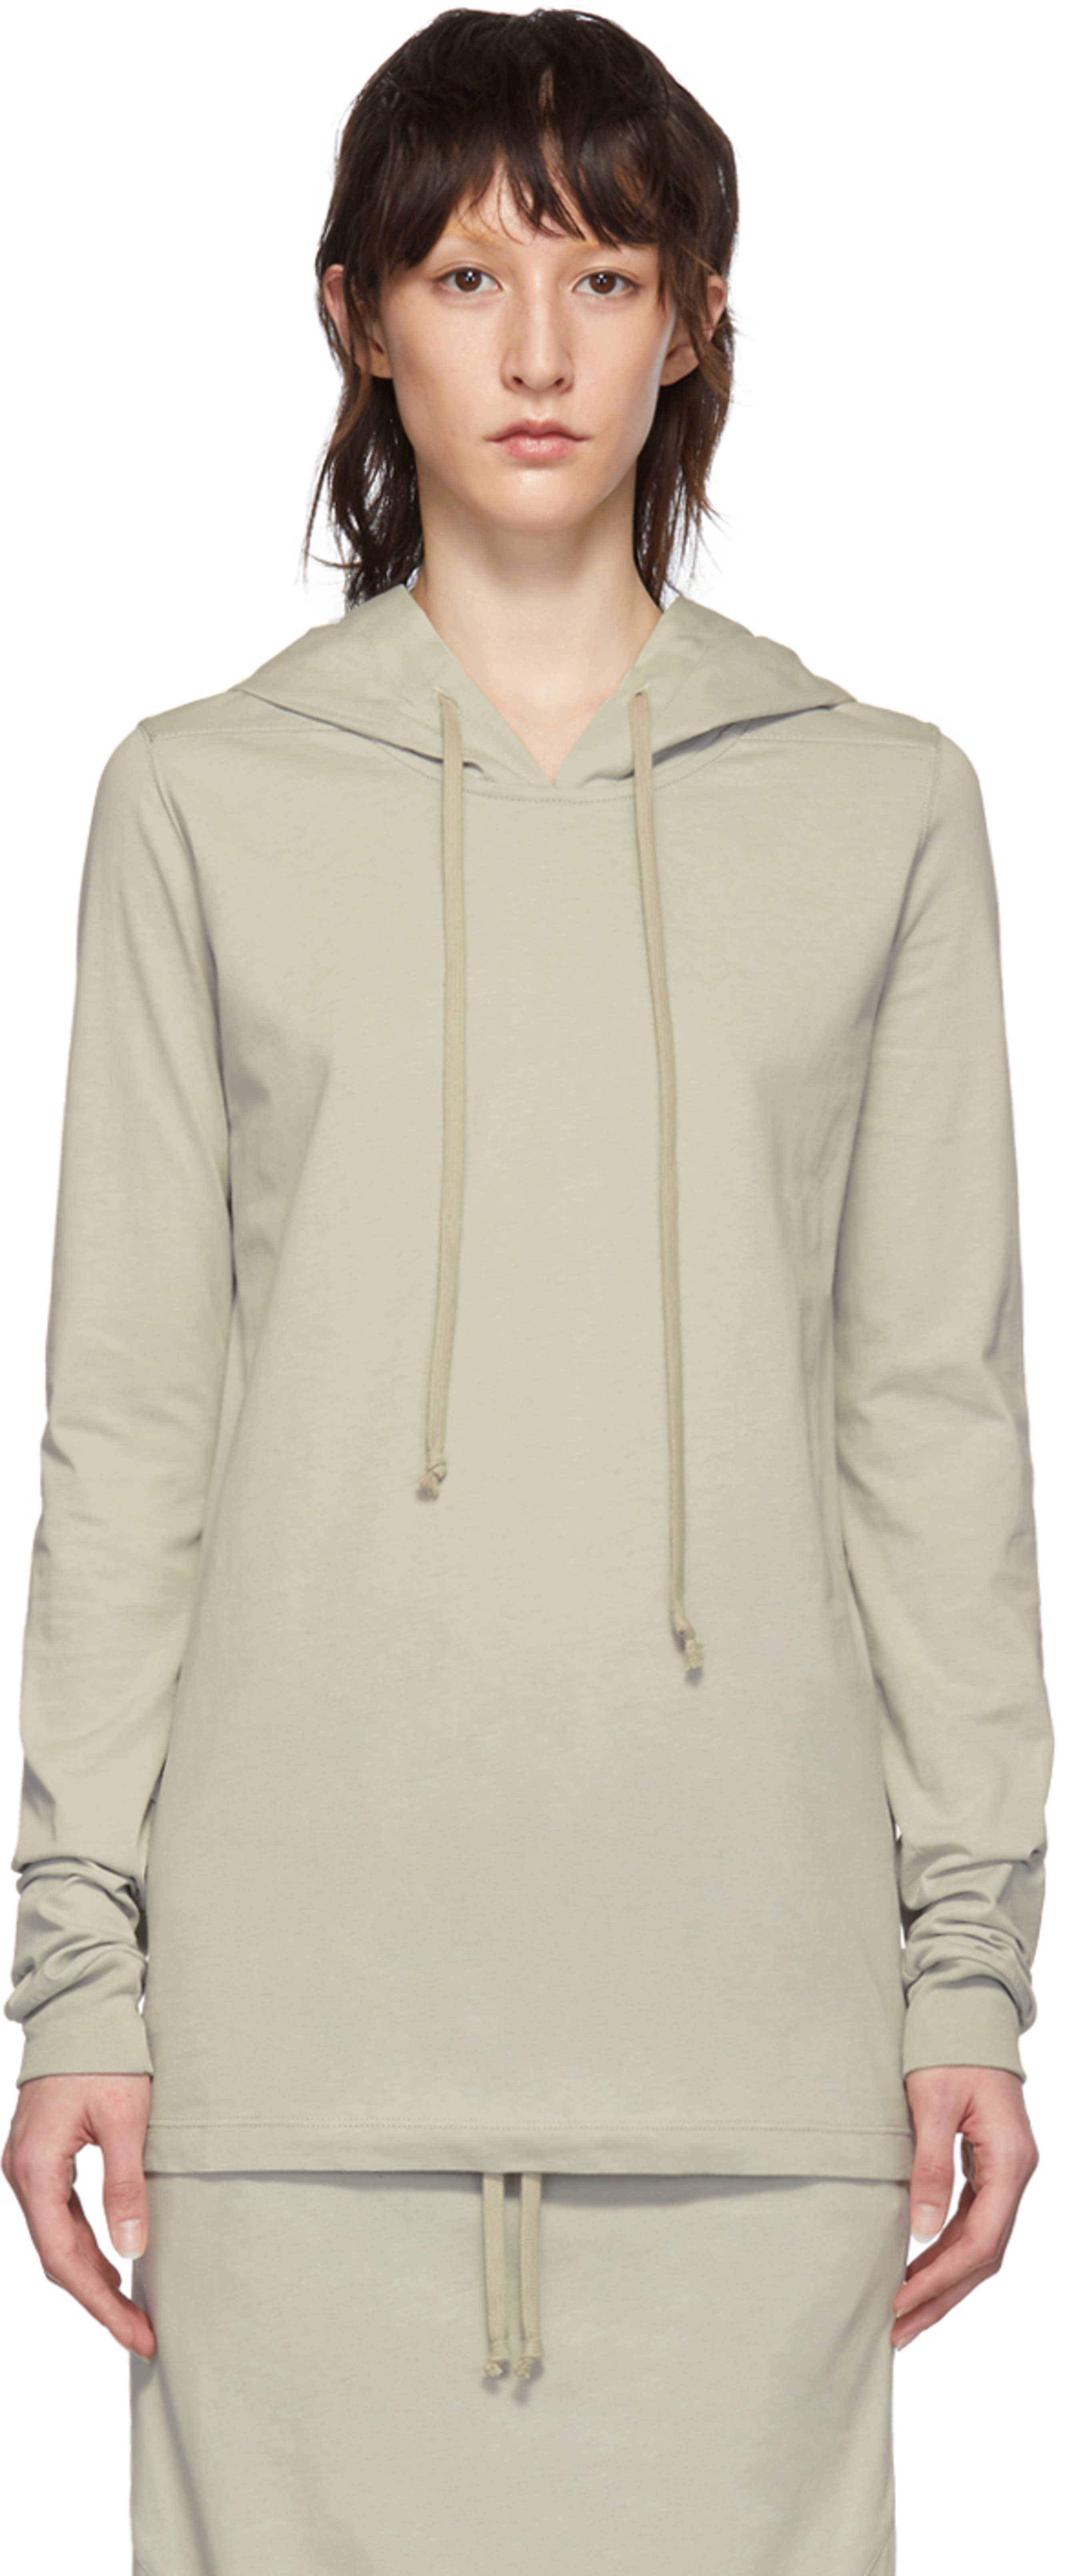 4fe2ef676da8 Designer hoodies   zipups for Women